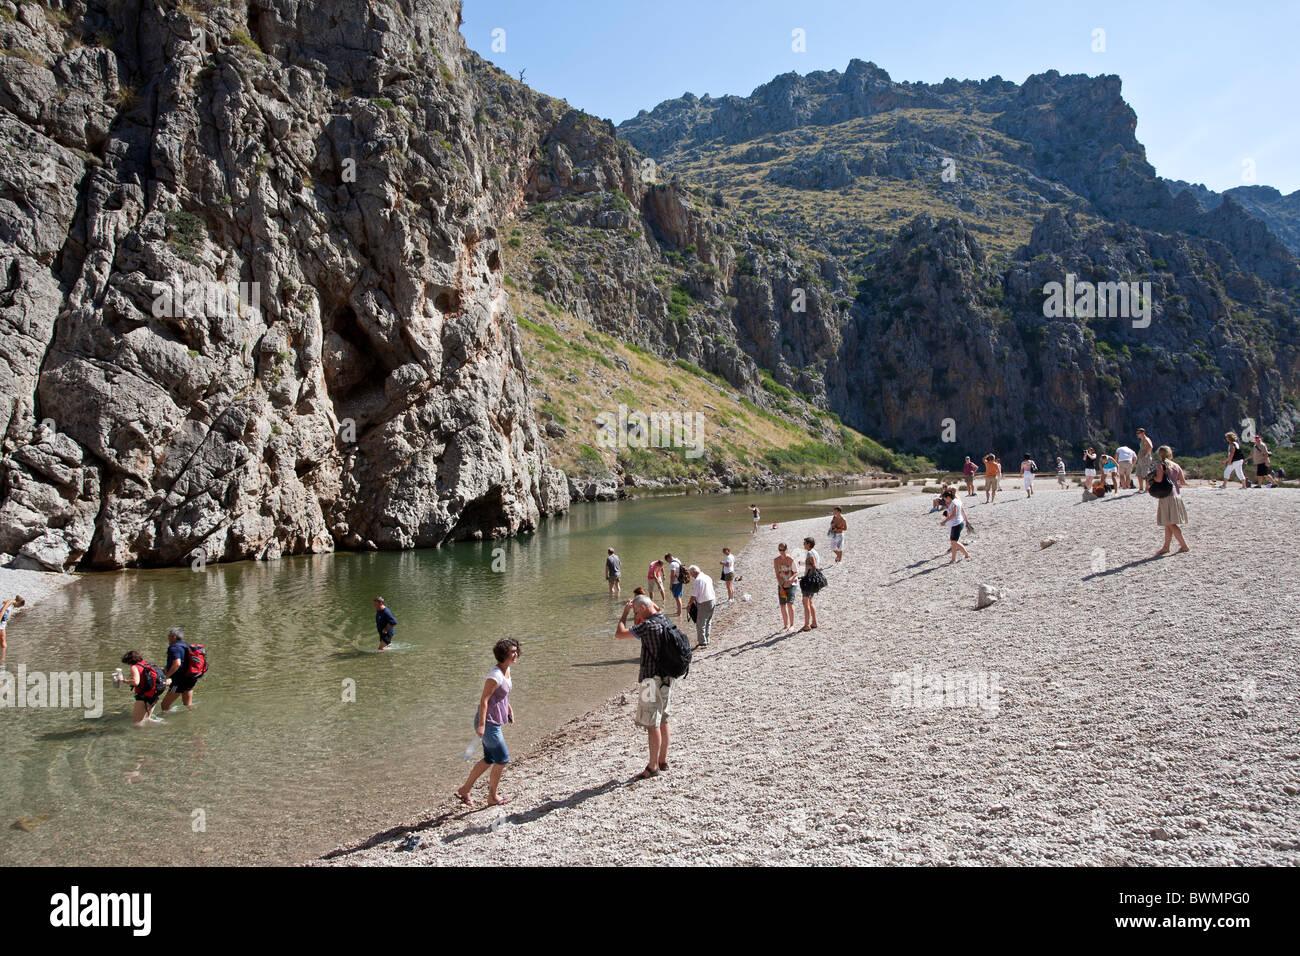 Tourists visiting Torrent de Pareis. Sa Calobra. Mallorca Island. Spain - Stock Image